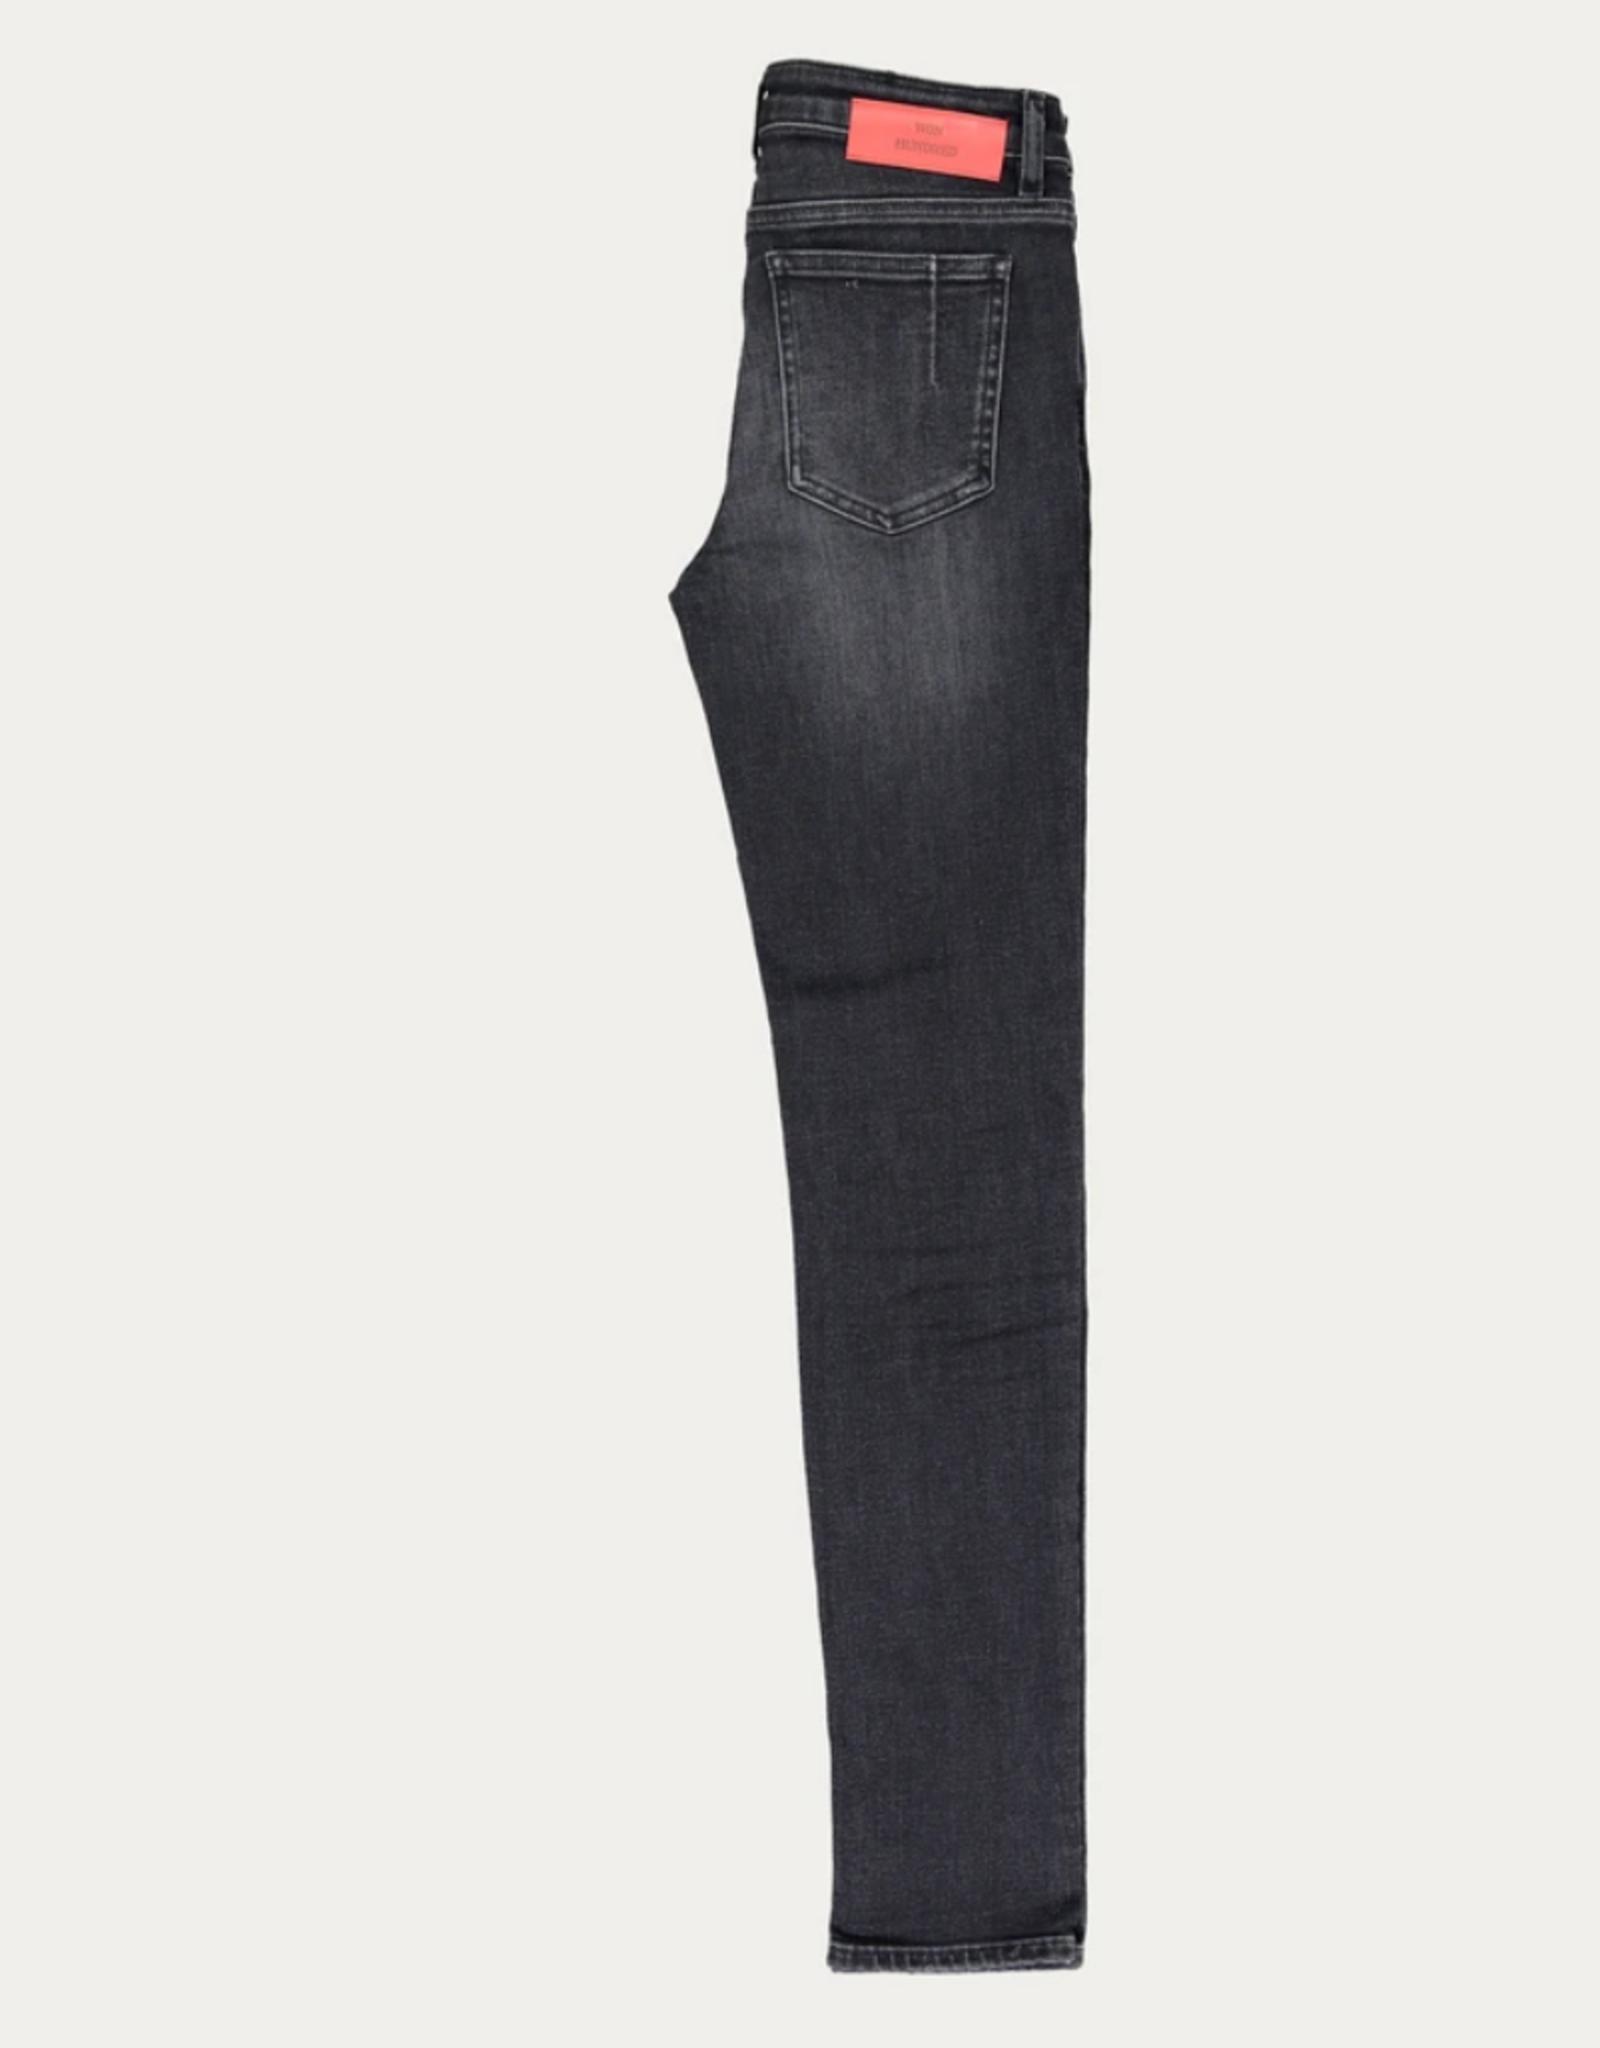 Patti jeans universe black